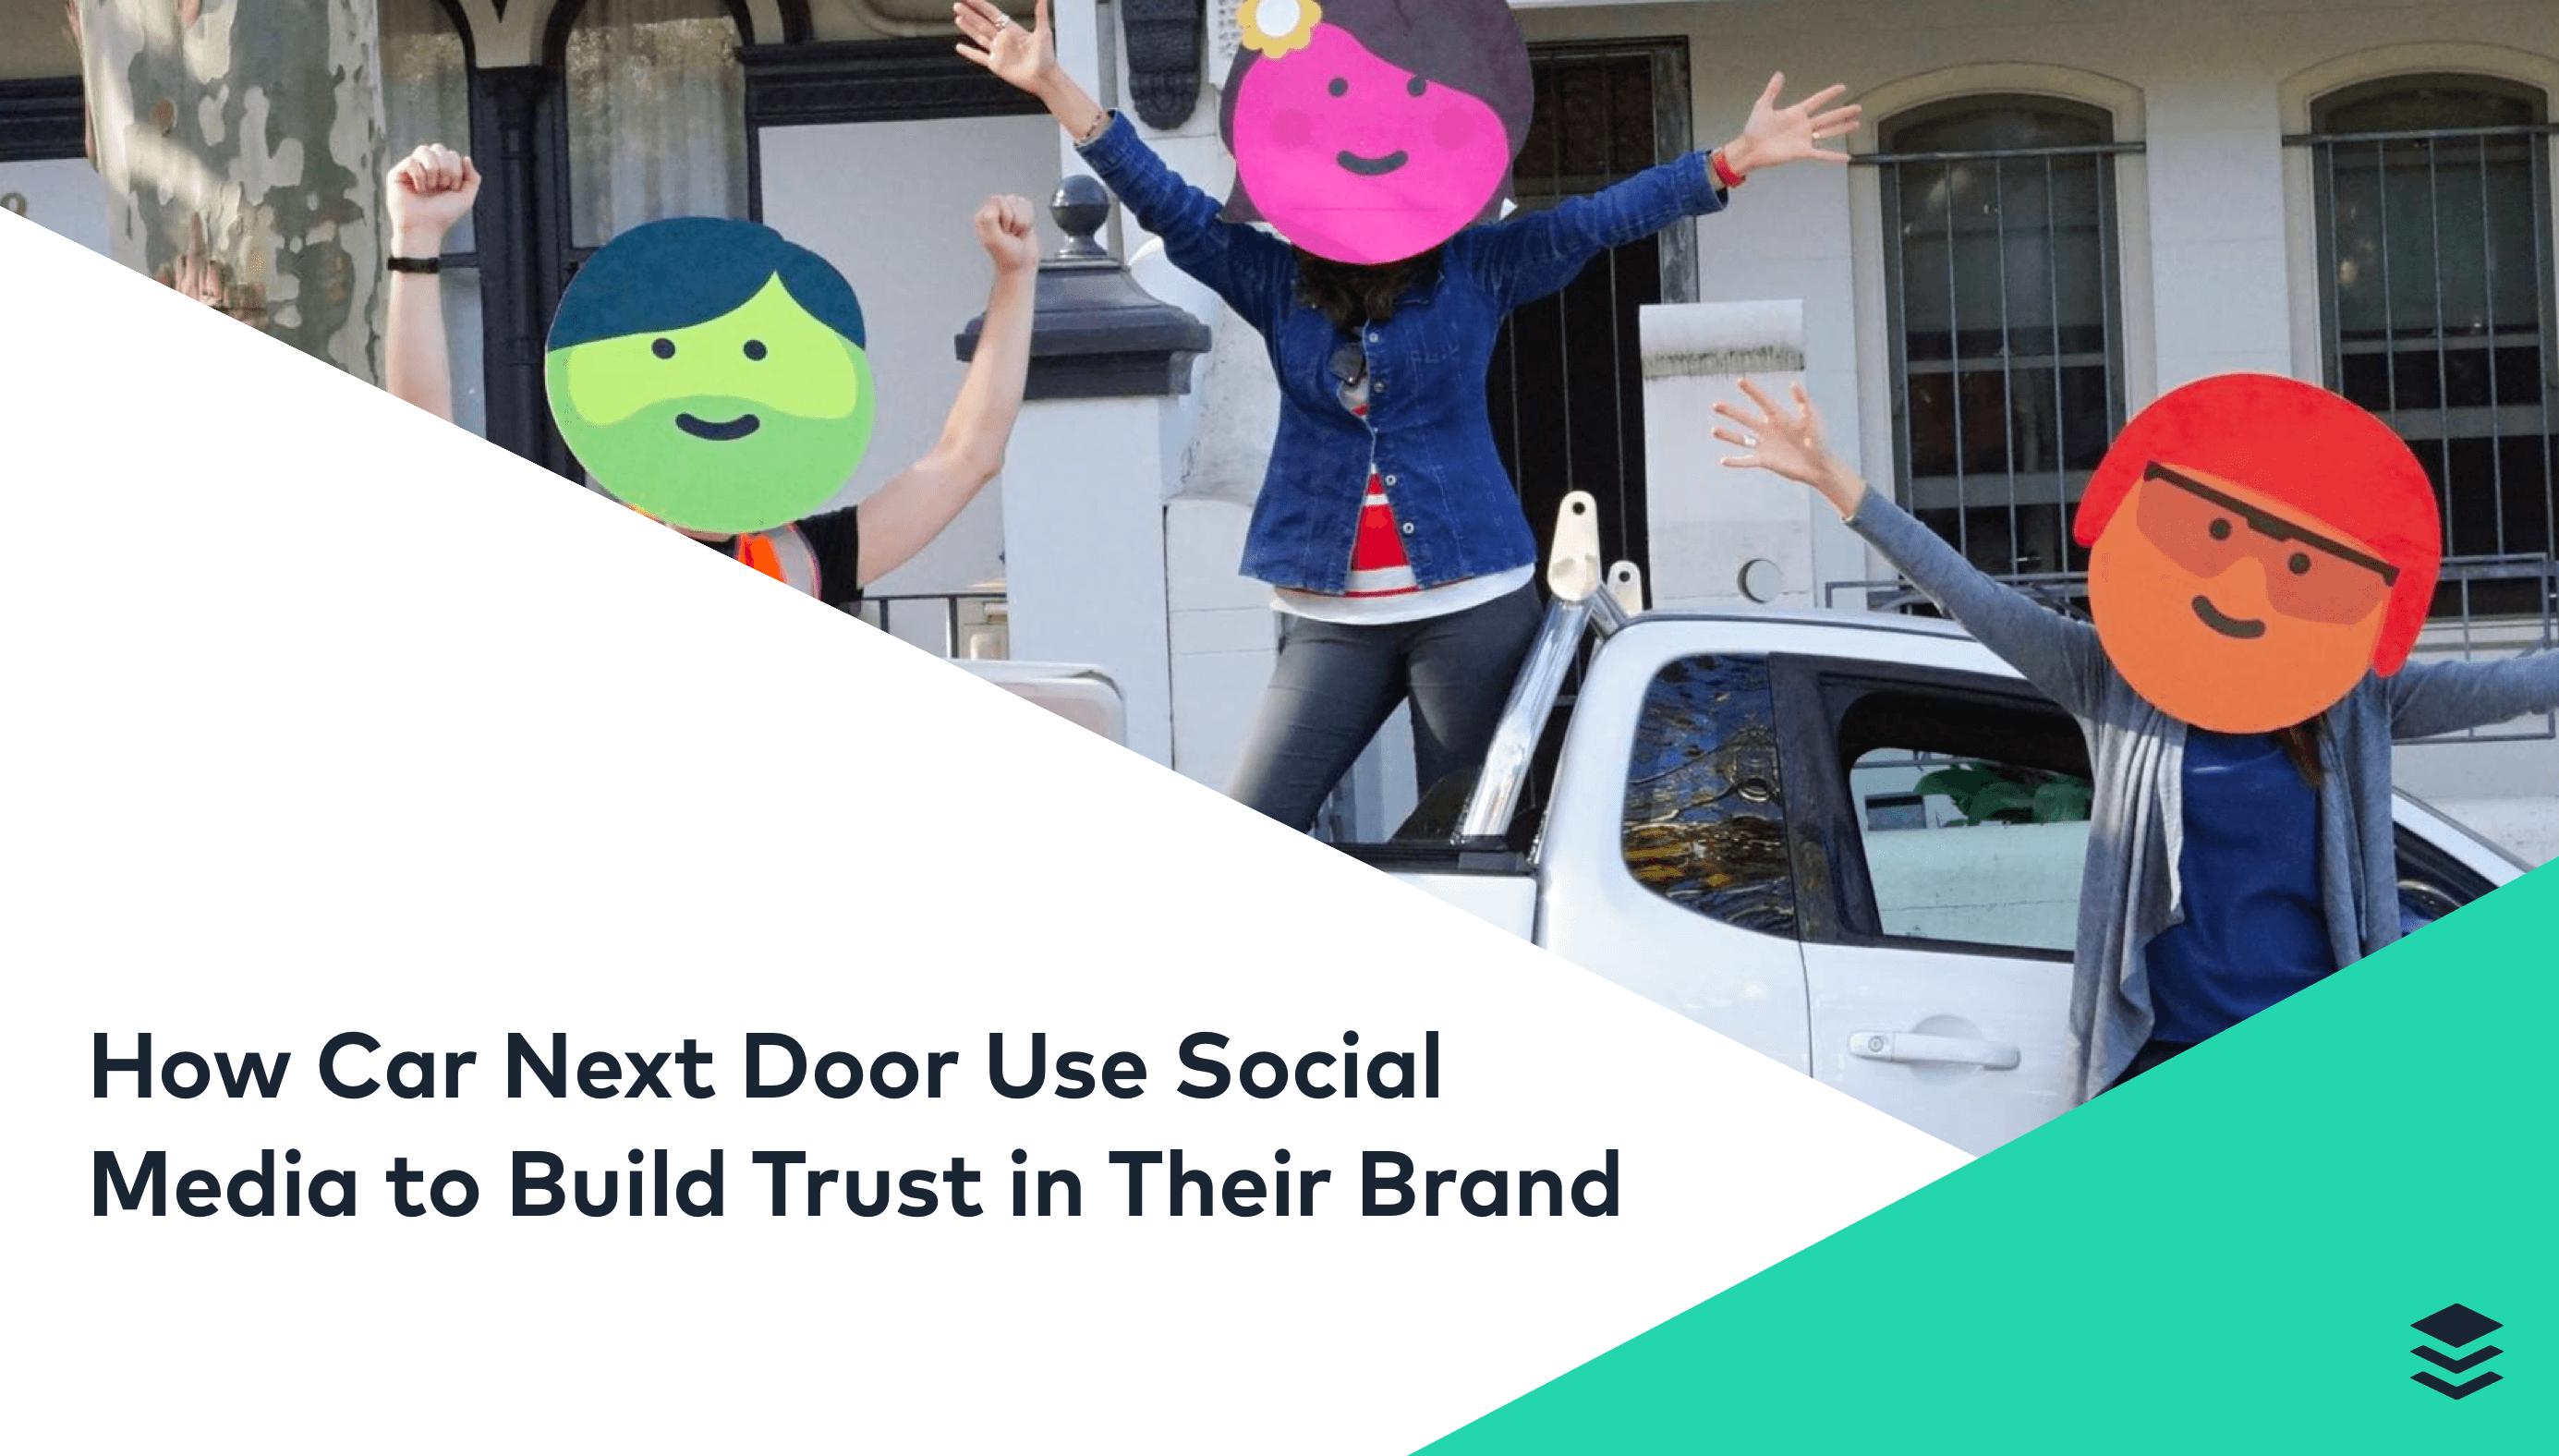 How Car Next Door Use Buffer to Build Trust on Social Media